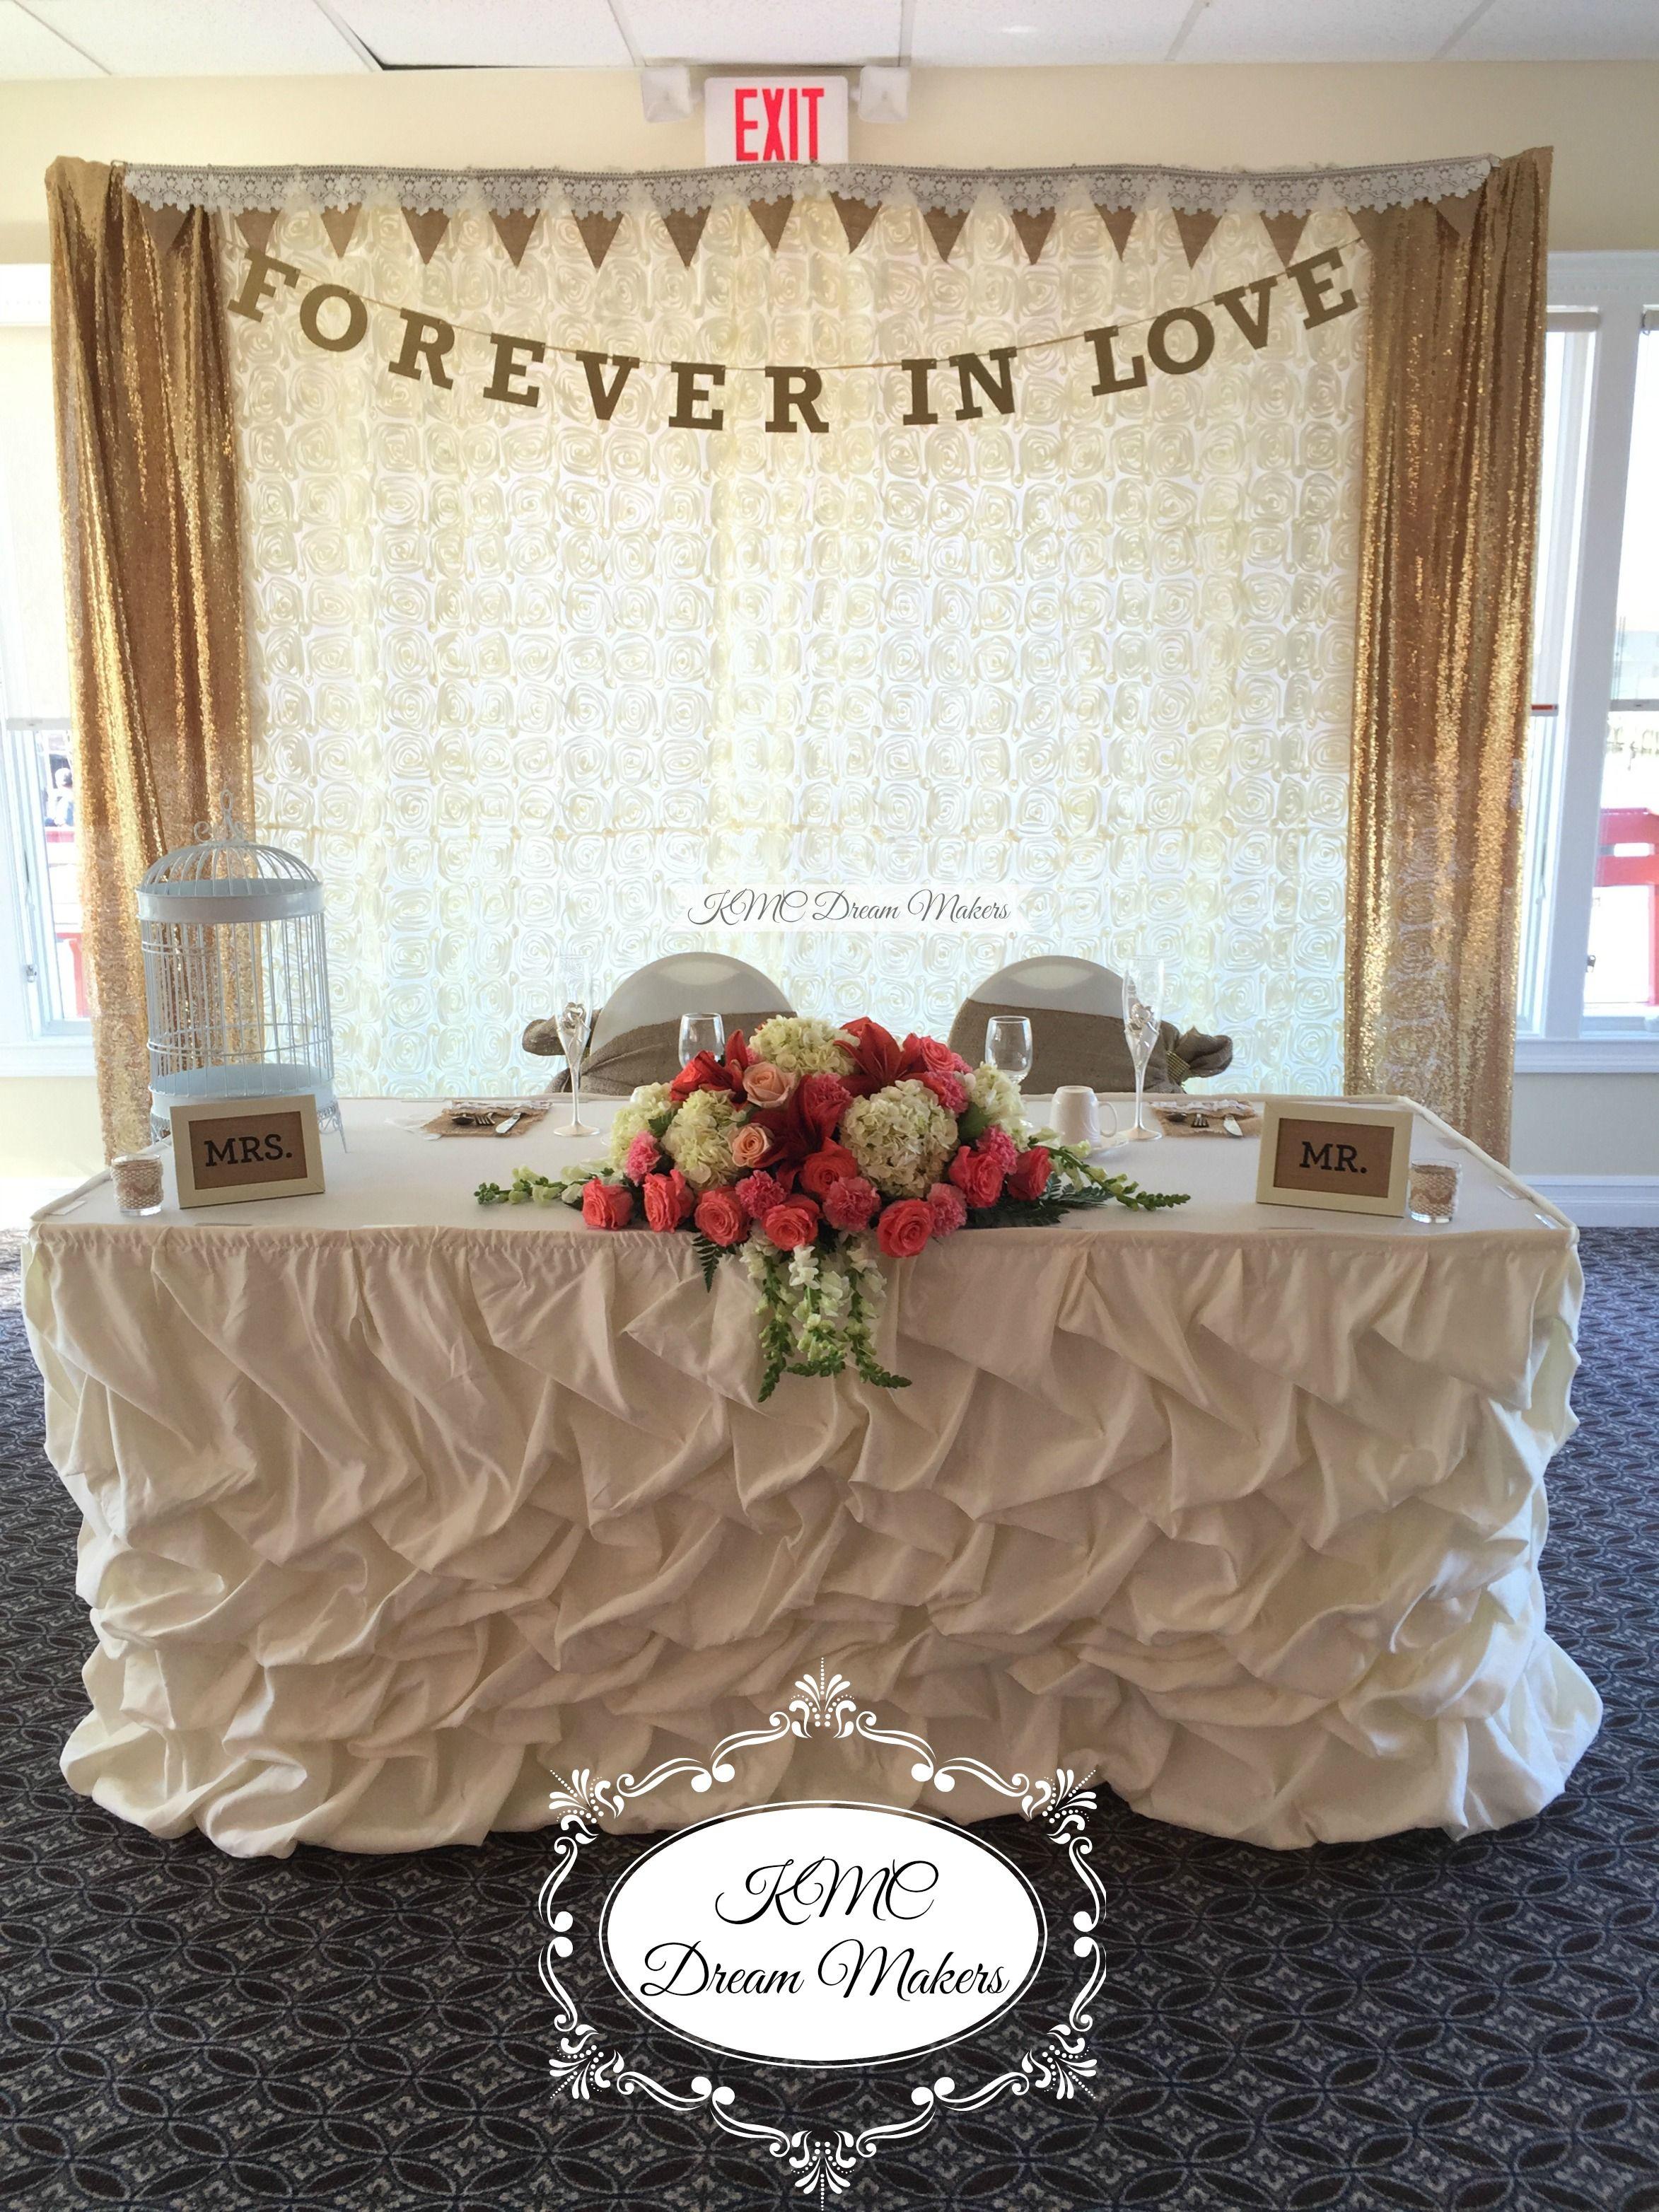 Bride & Groom Table! #kmcdreammakers  #flowers #bride #groom #weddings #burlap #coral #gold #decor #decorations #backdrop #sequins